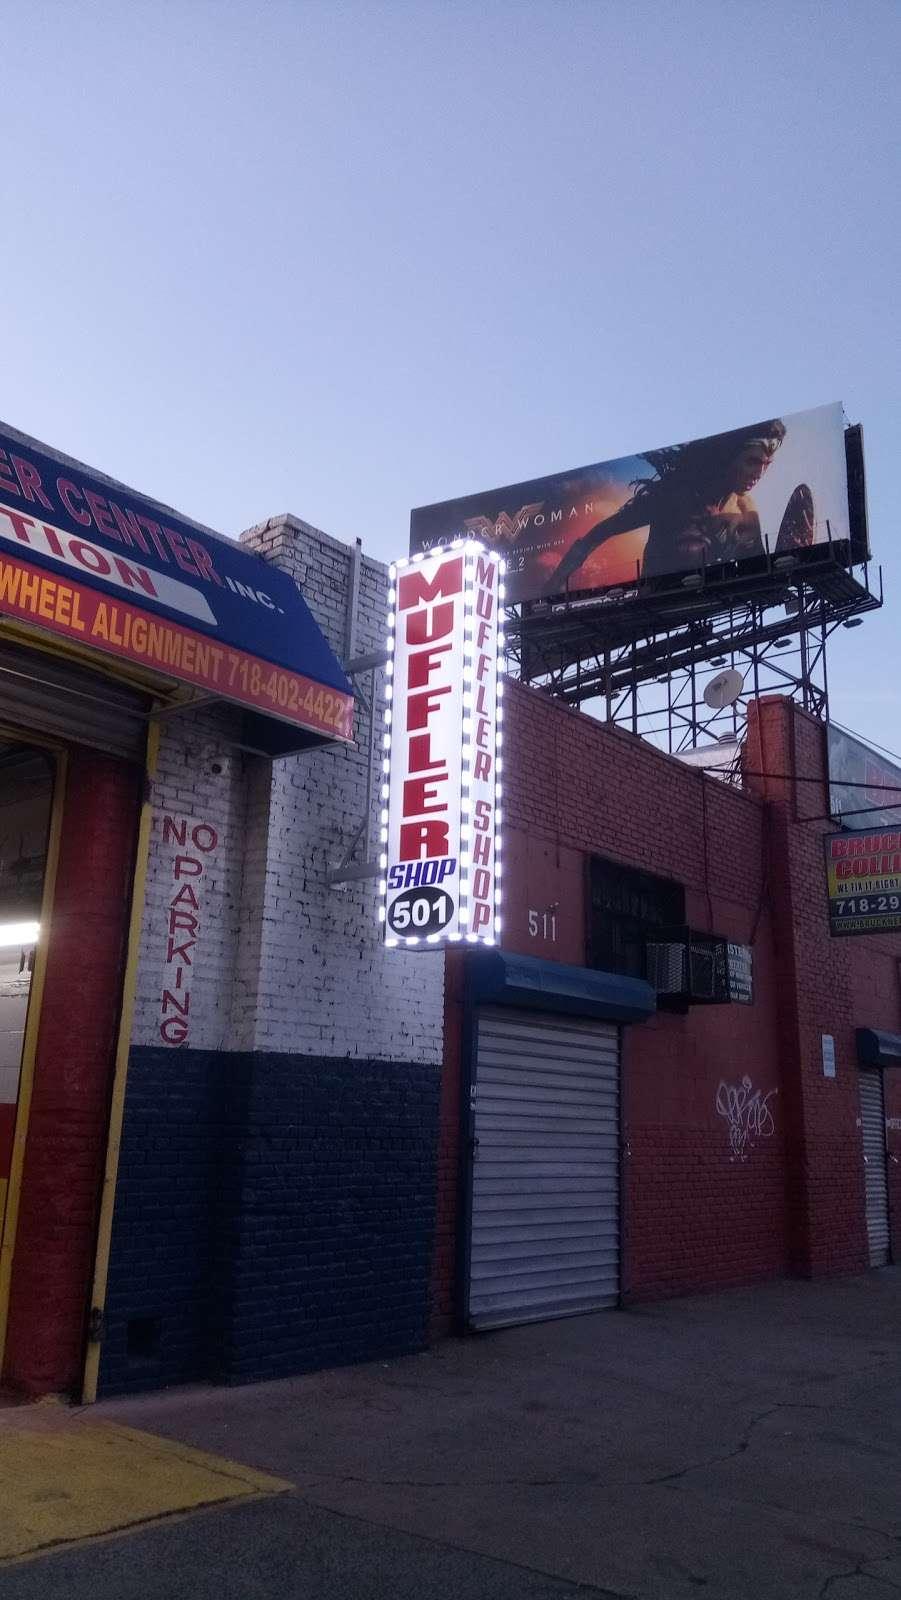 Bronx Discount Muffler Center - car repair  | Photo 5 of 10 | Address: 501 Bruckner Blvd, Bronx, NY 10455, USA | Phone: (718) 402-4422